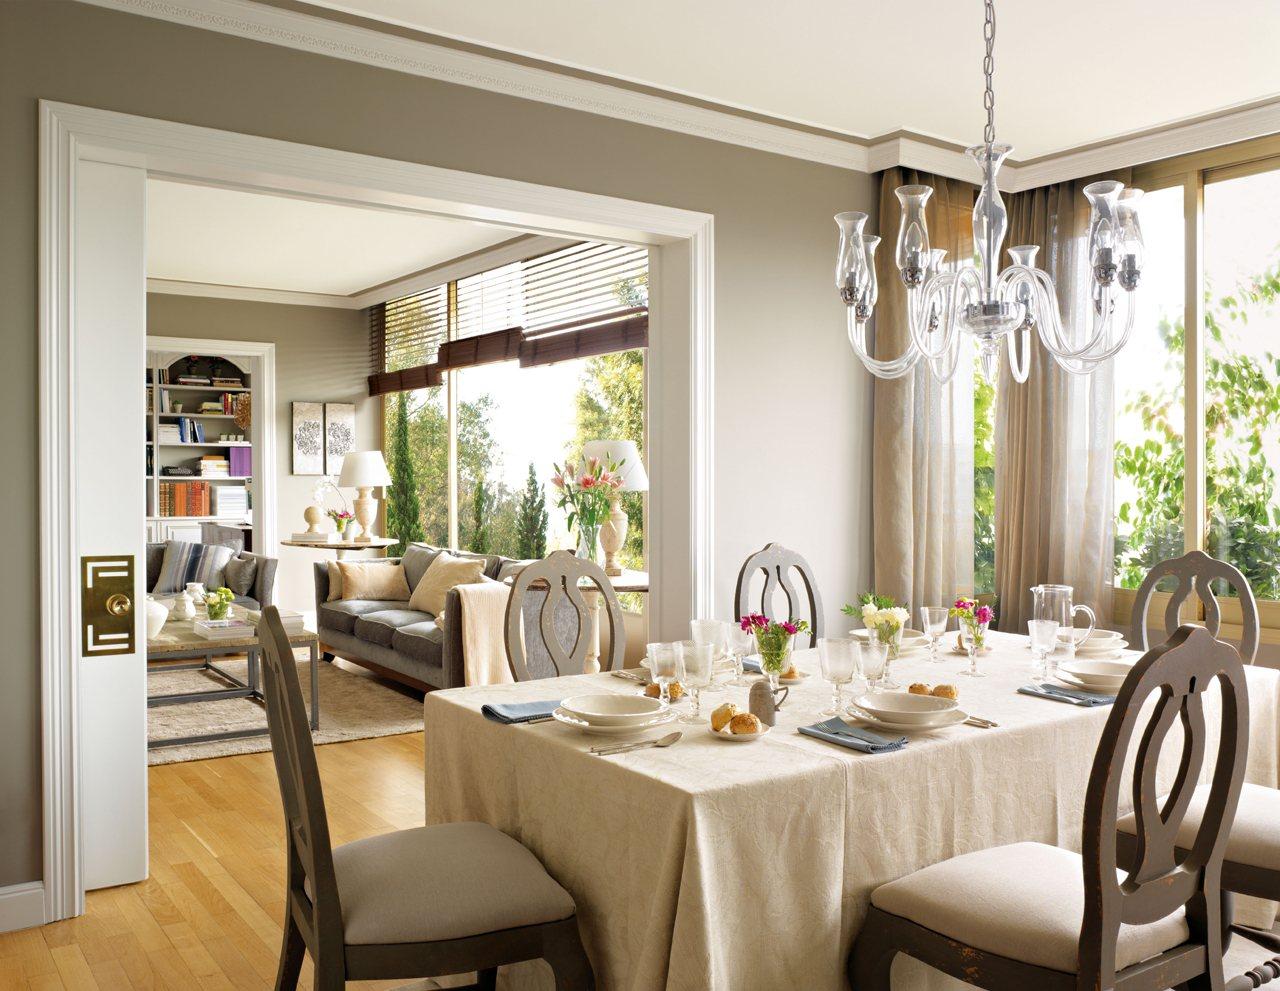 Consejos para decorar el comedor for Como decorar un living comedor rectangular grande